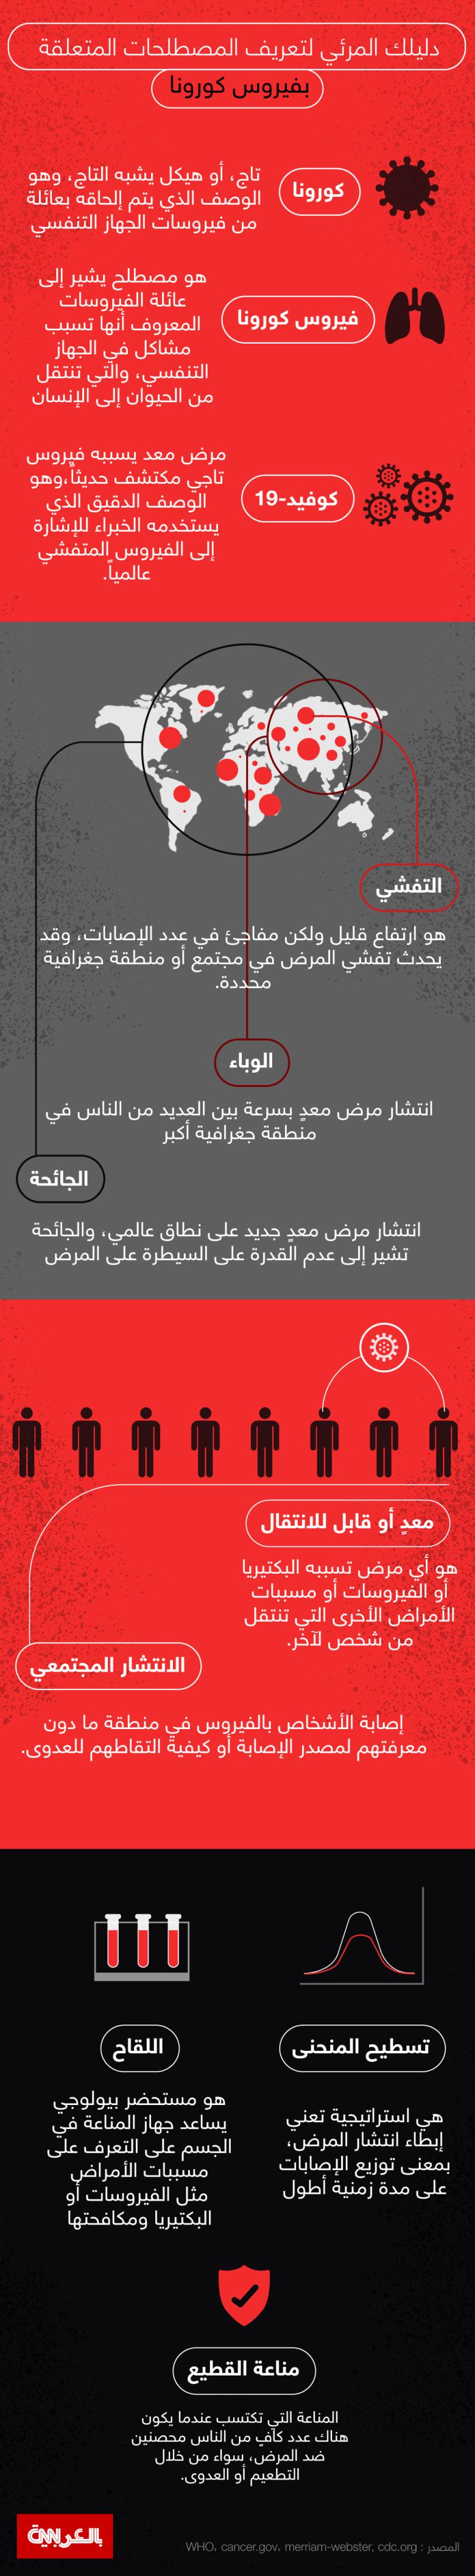 corona-definition-infographic